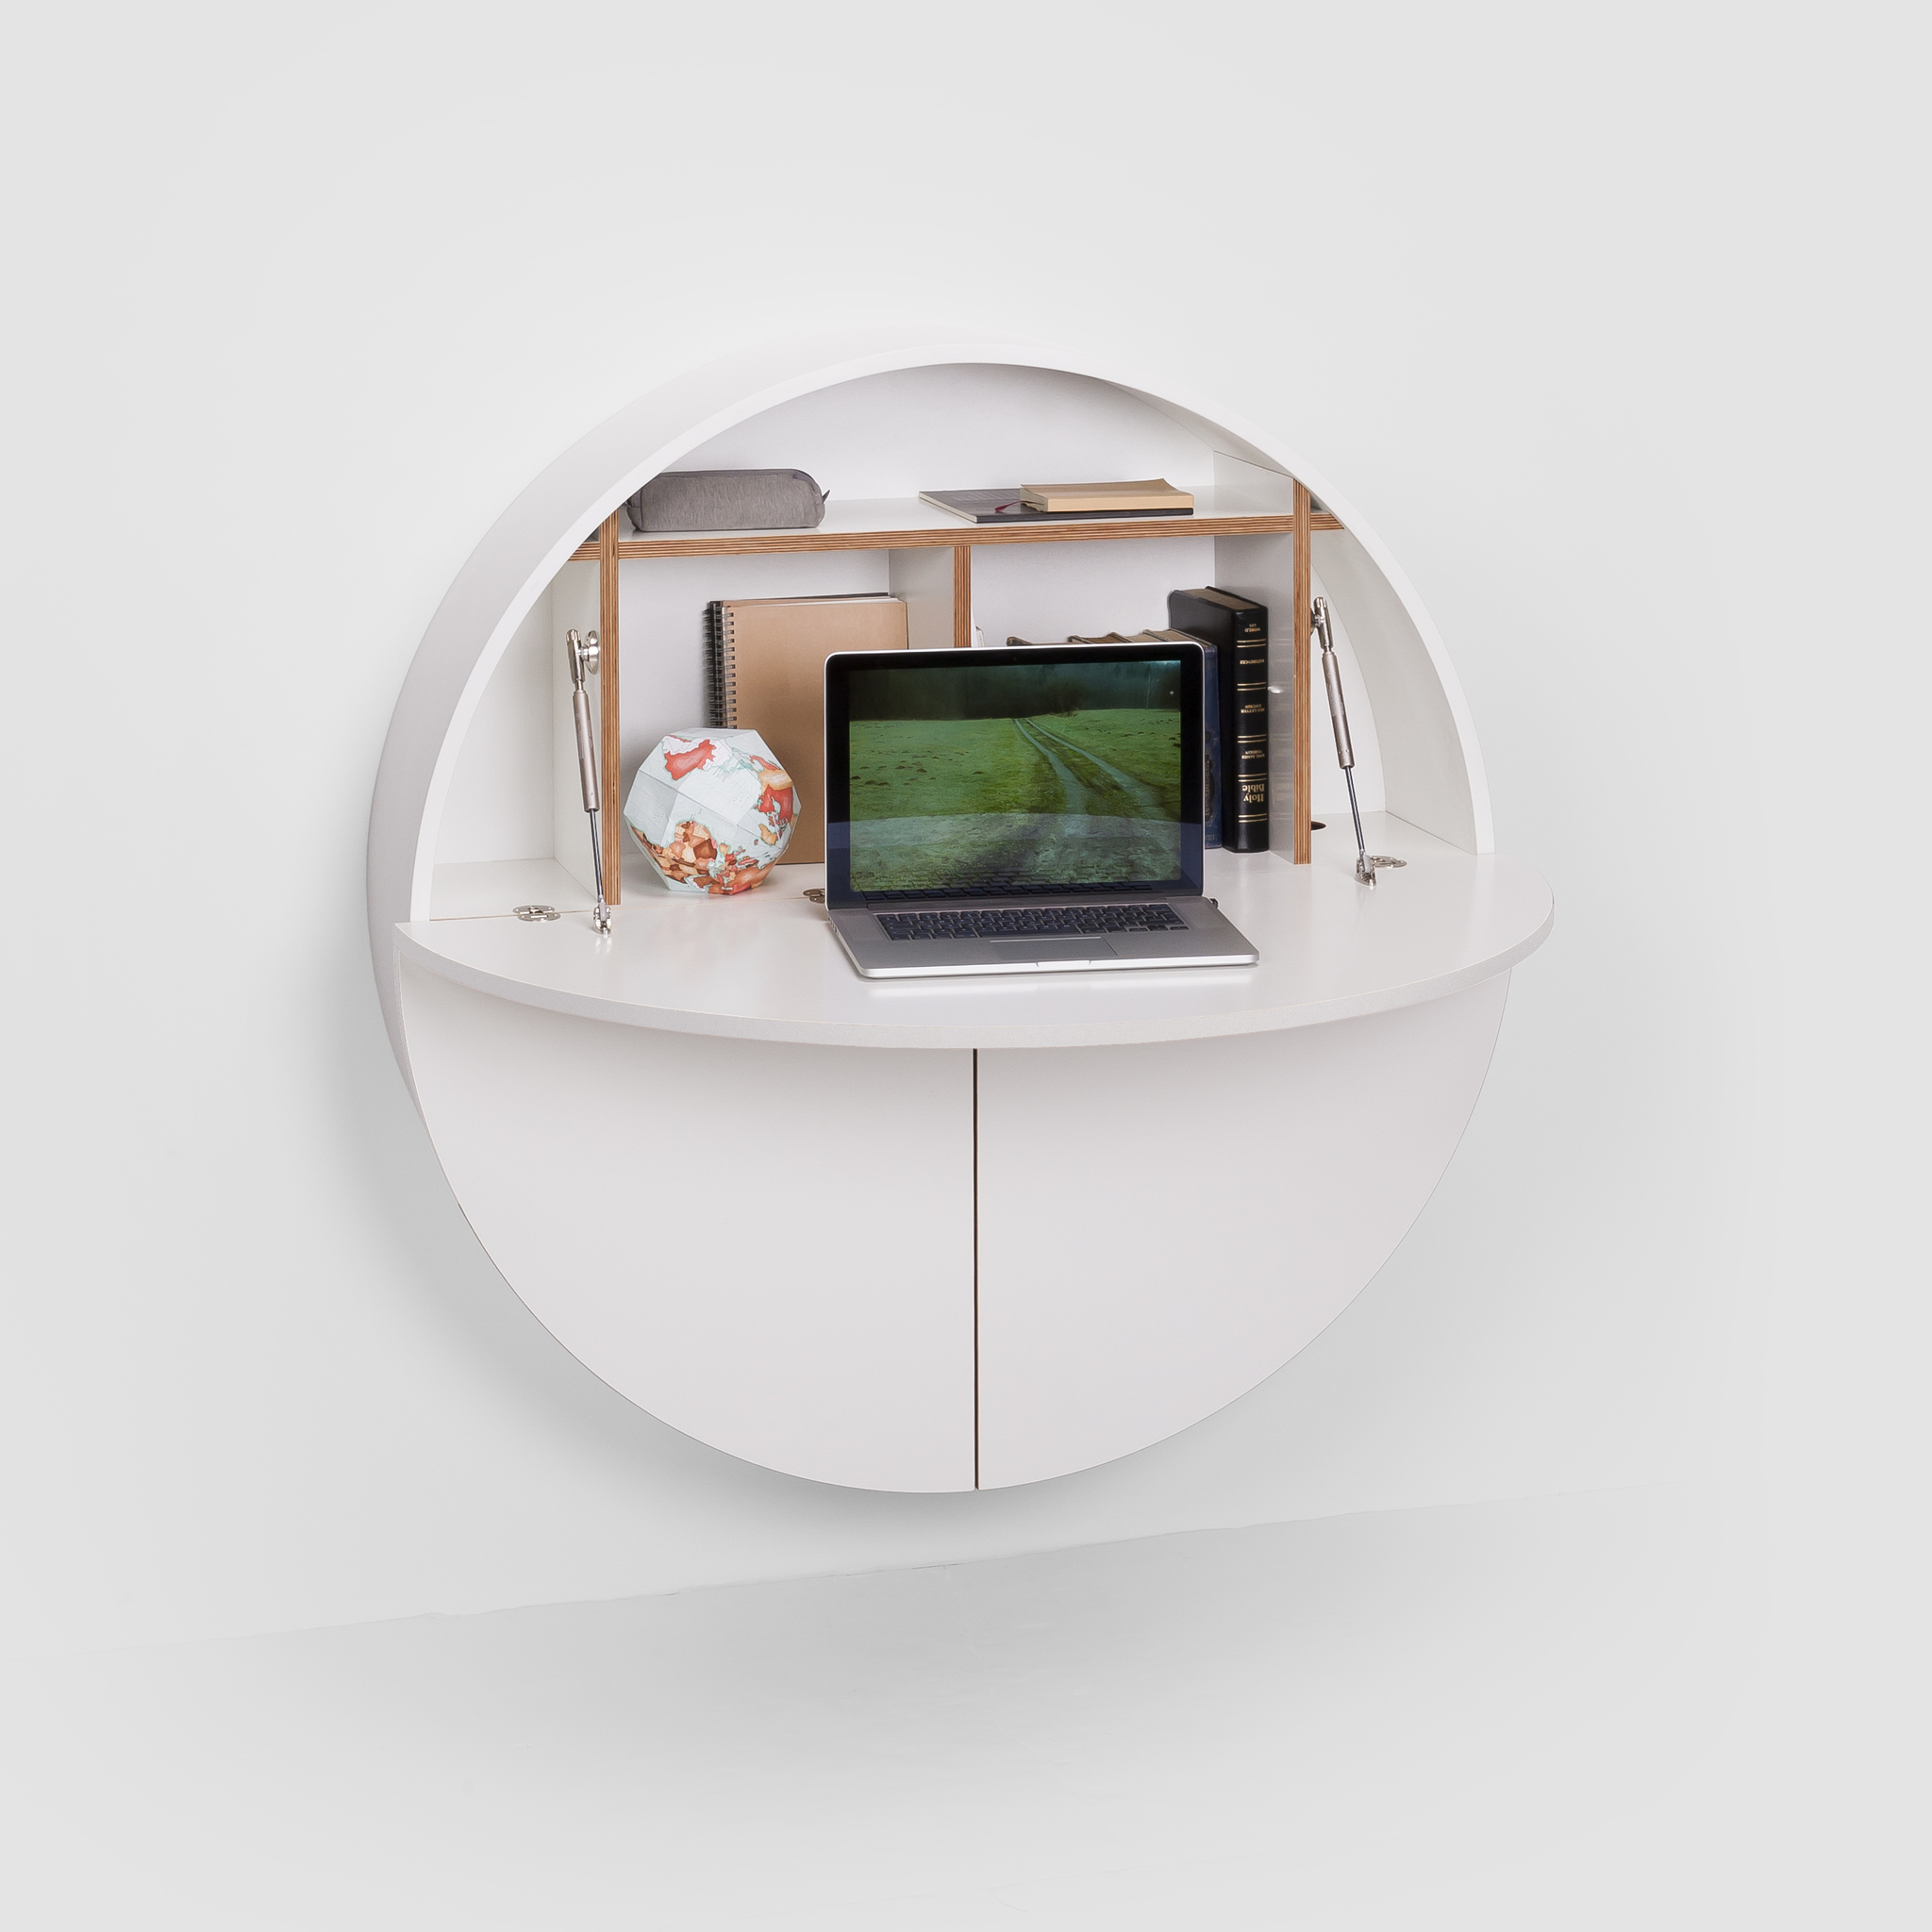 Moderner sekret r m bel von emko - Mobili computer a scomparsa ...